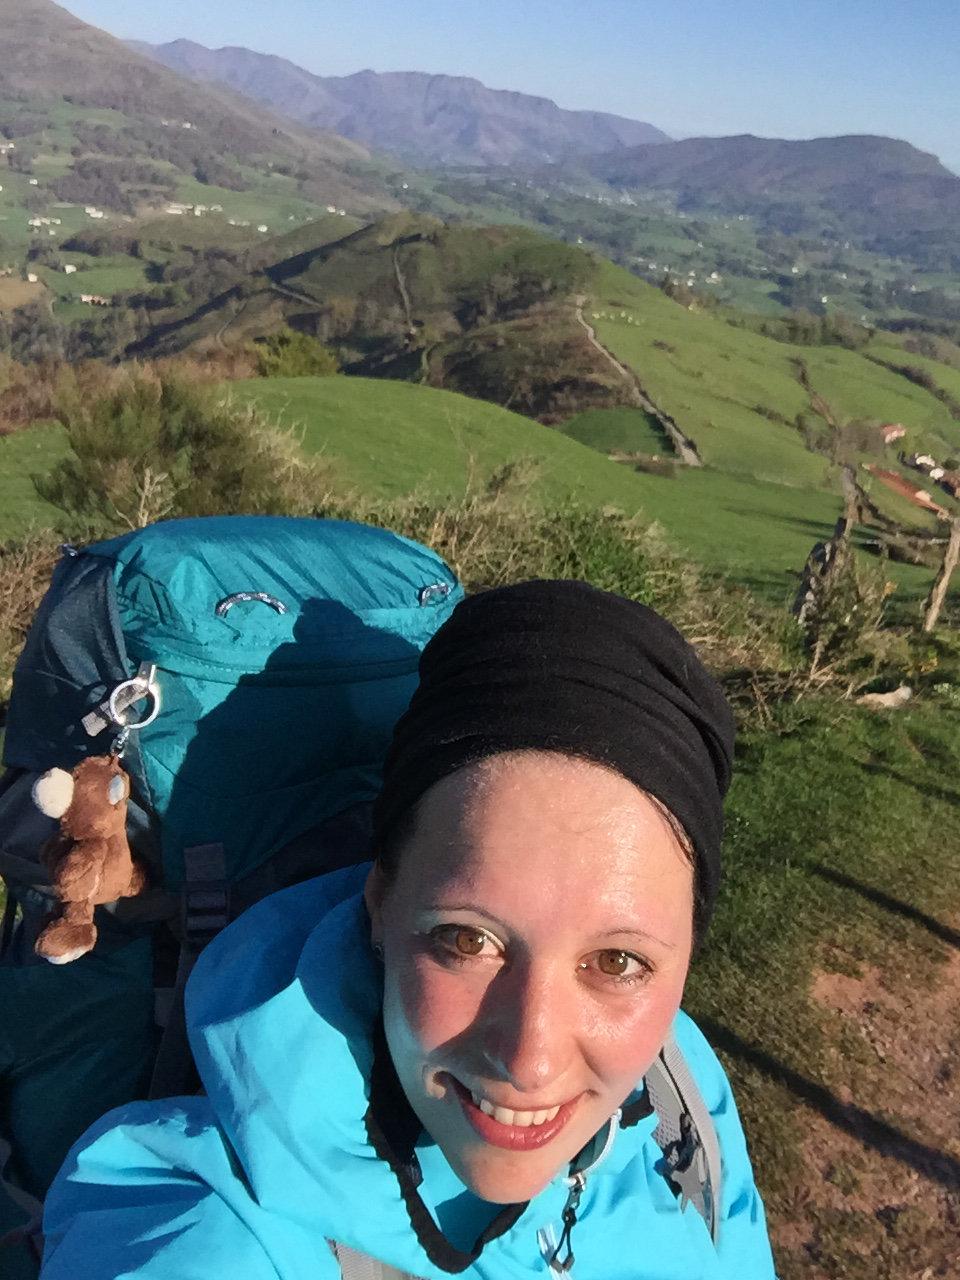 Bianca auf dem Ibaneta Pass, Camino Francés, Wandern, Wandertour, Pilgern, Jakobsweg, Pyrenäeen, Frankreich, Spanien